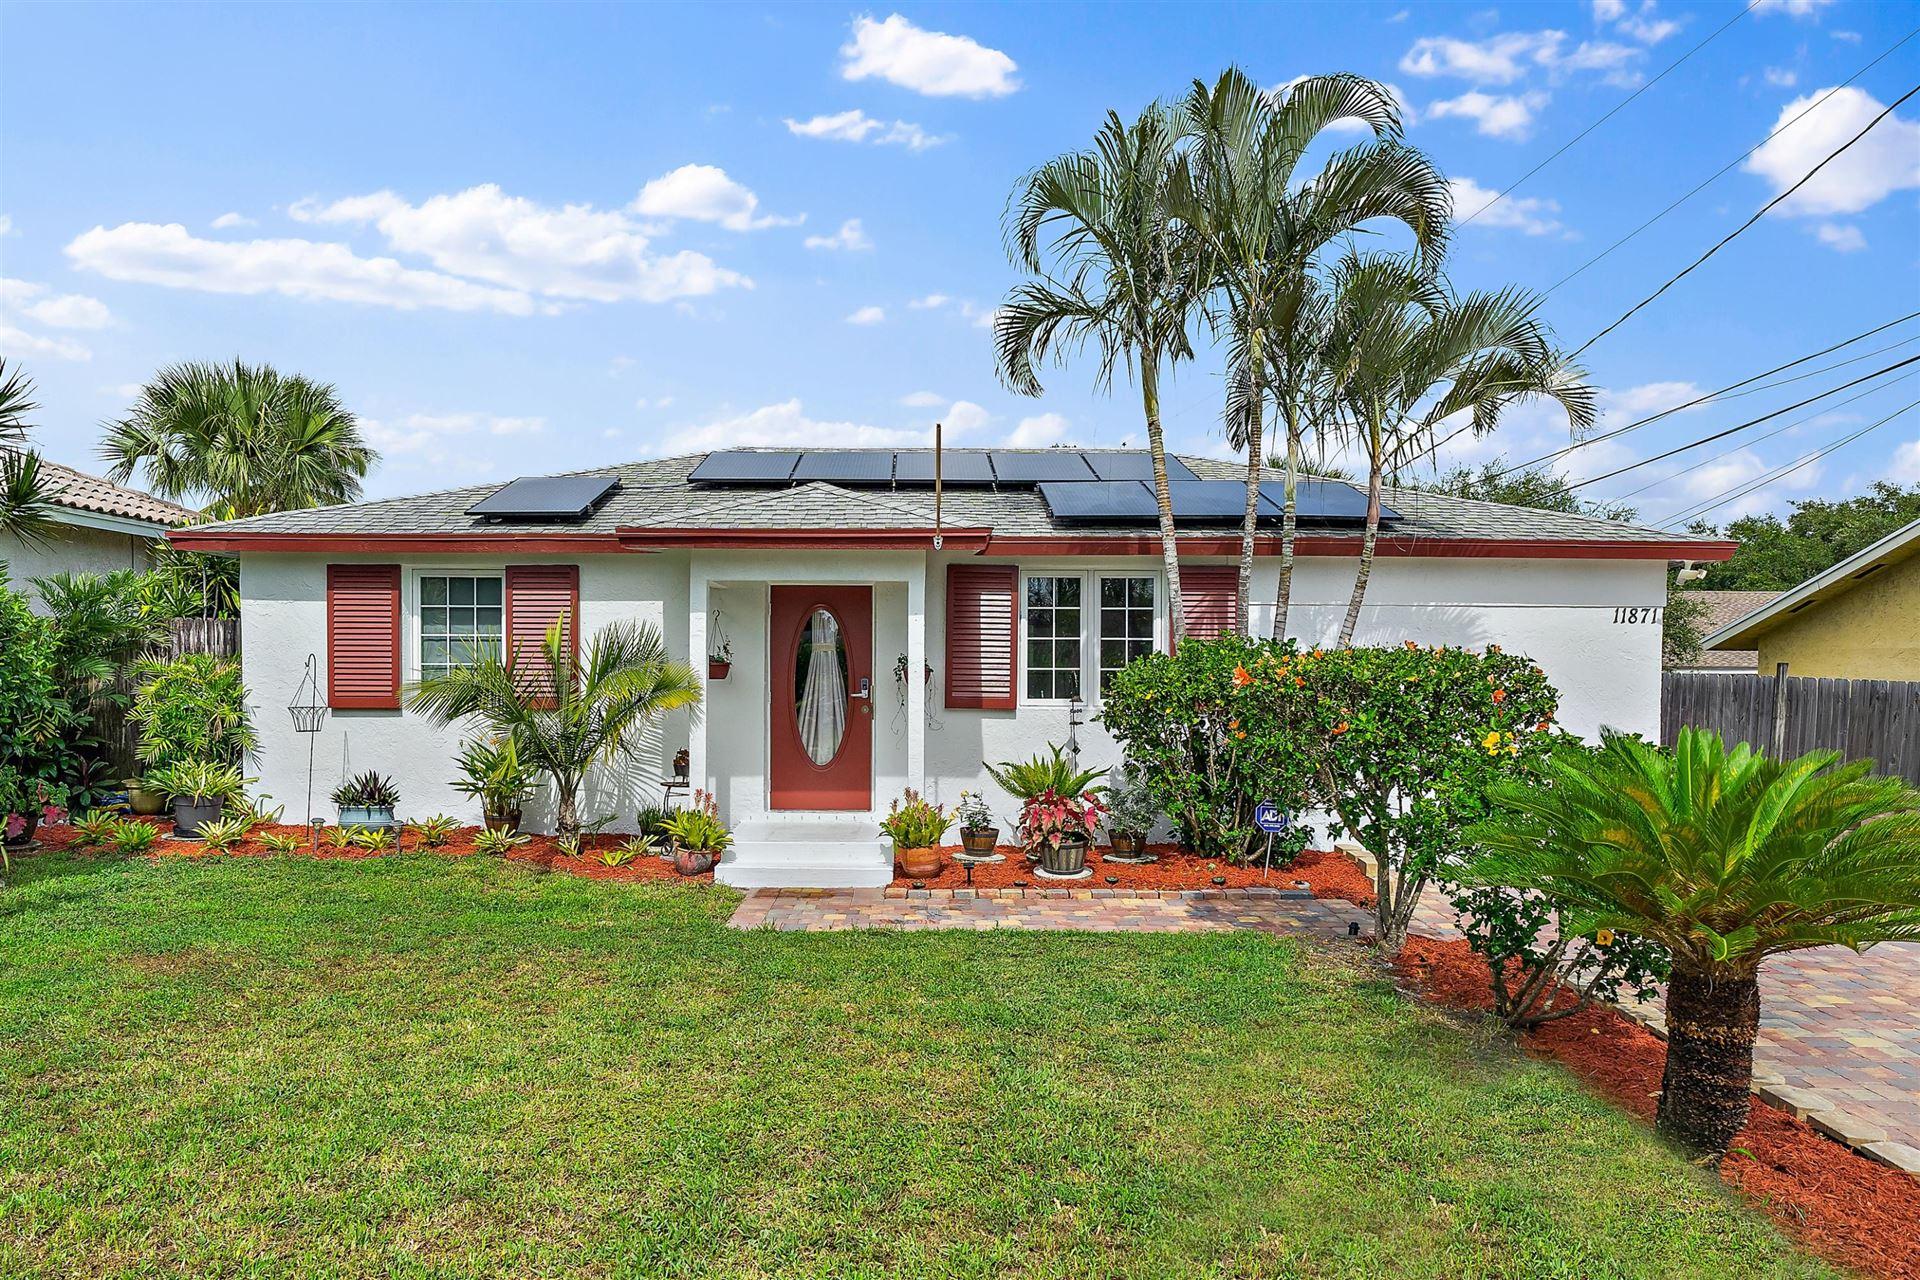 11871 Ellison Wilson Road, North Palm Beach, FL 33408 - MLS#: RX-10739688